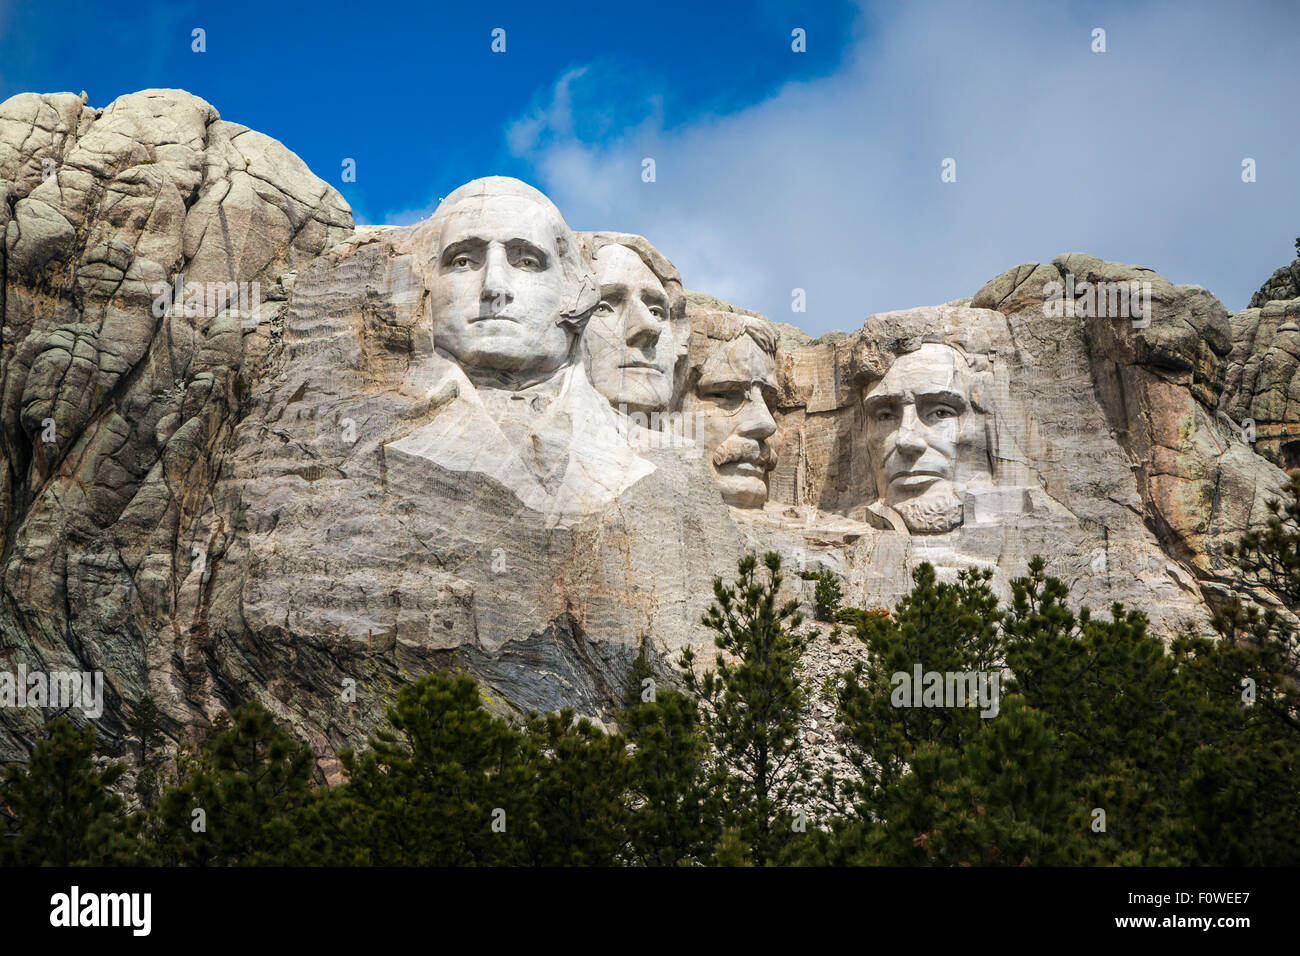 The display of Presidents at the Mount Rushmore National Memorial near Keystone, South Dakota, USA. - Stock Image